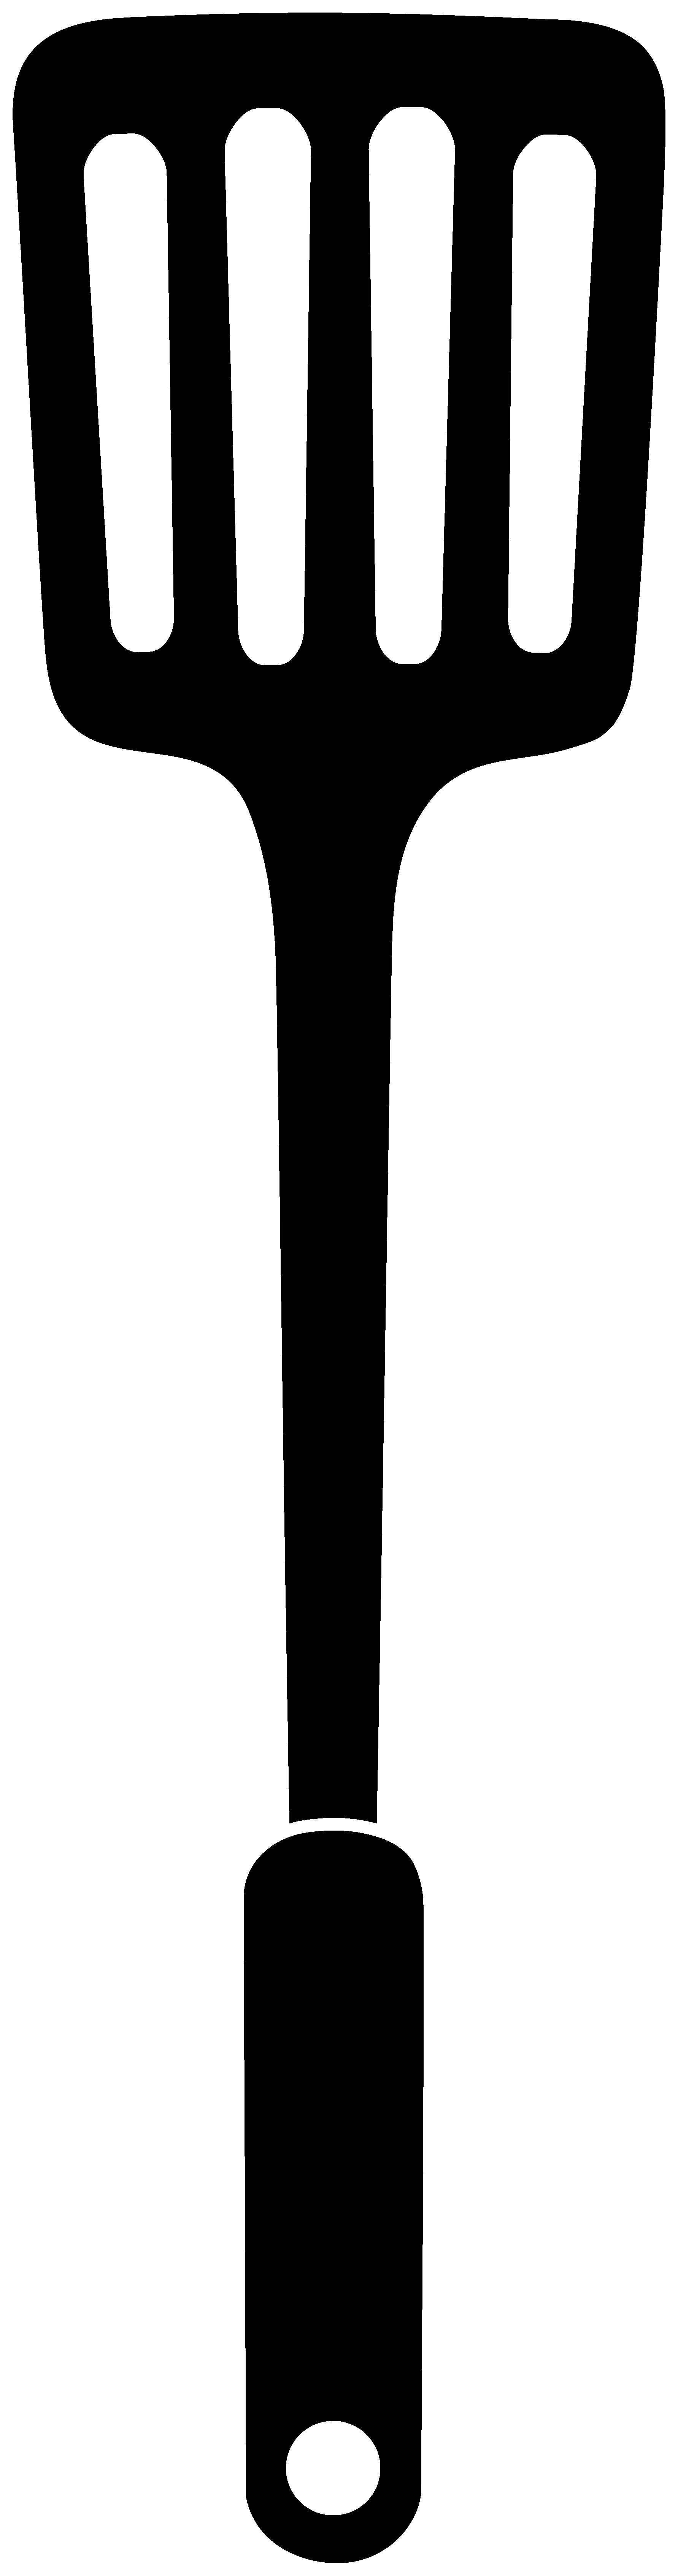 1783x6777 Drawn Spoon Silhouette